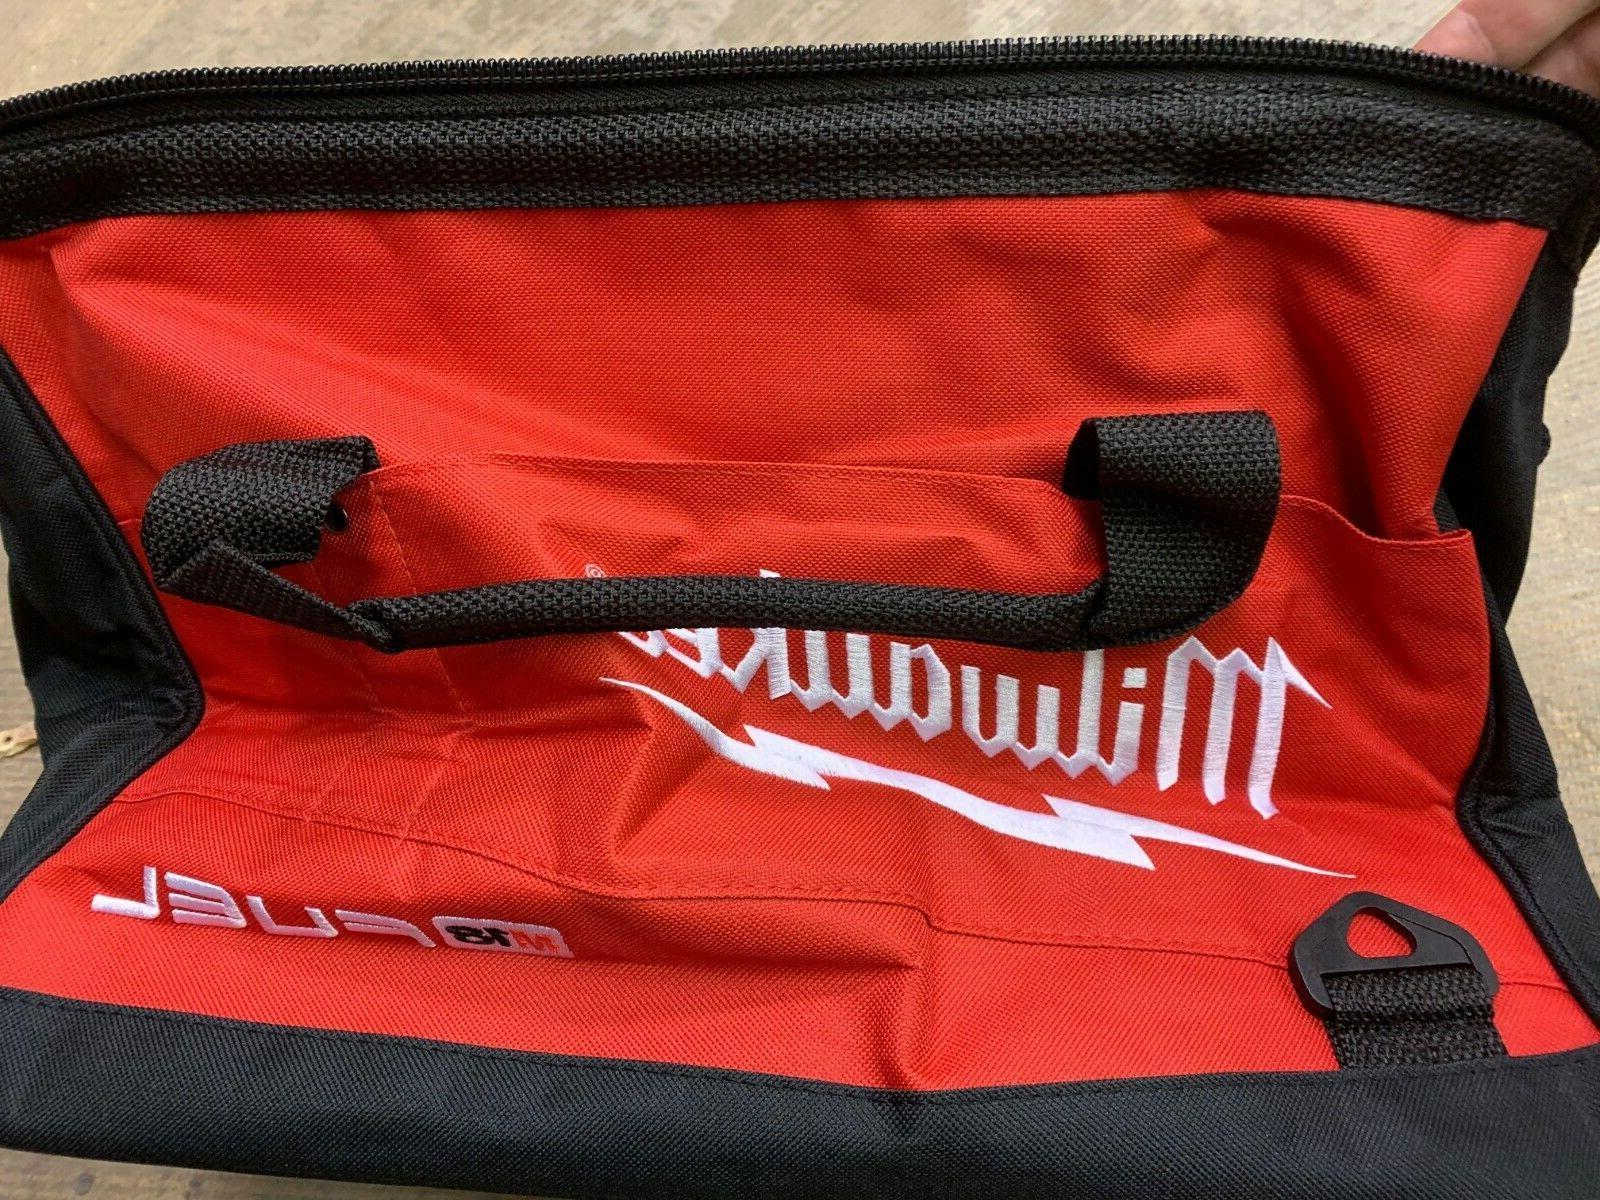 Milwaukee Heavy FUEL Tool Bag Fits 2730-21, 2730-20 Circular S